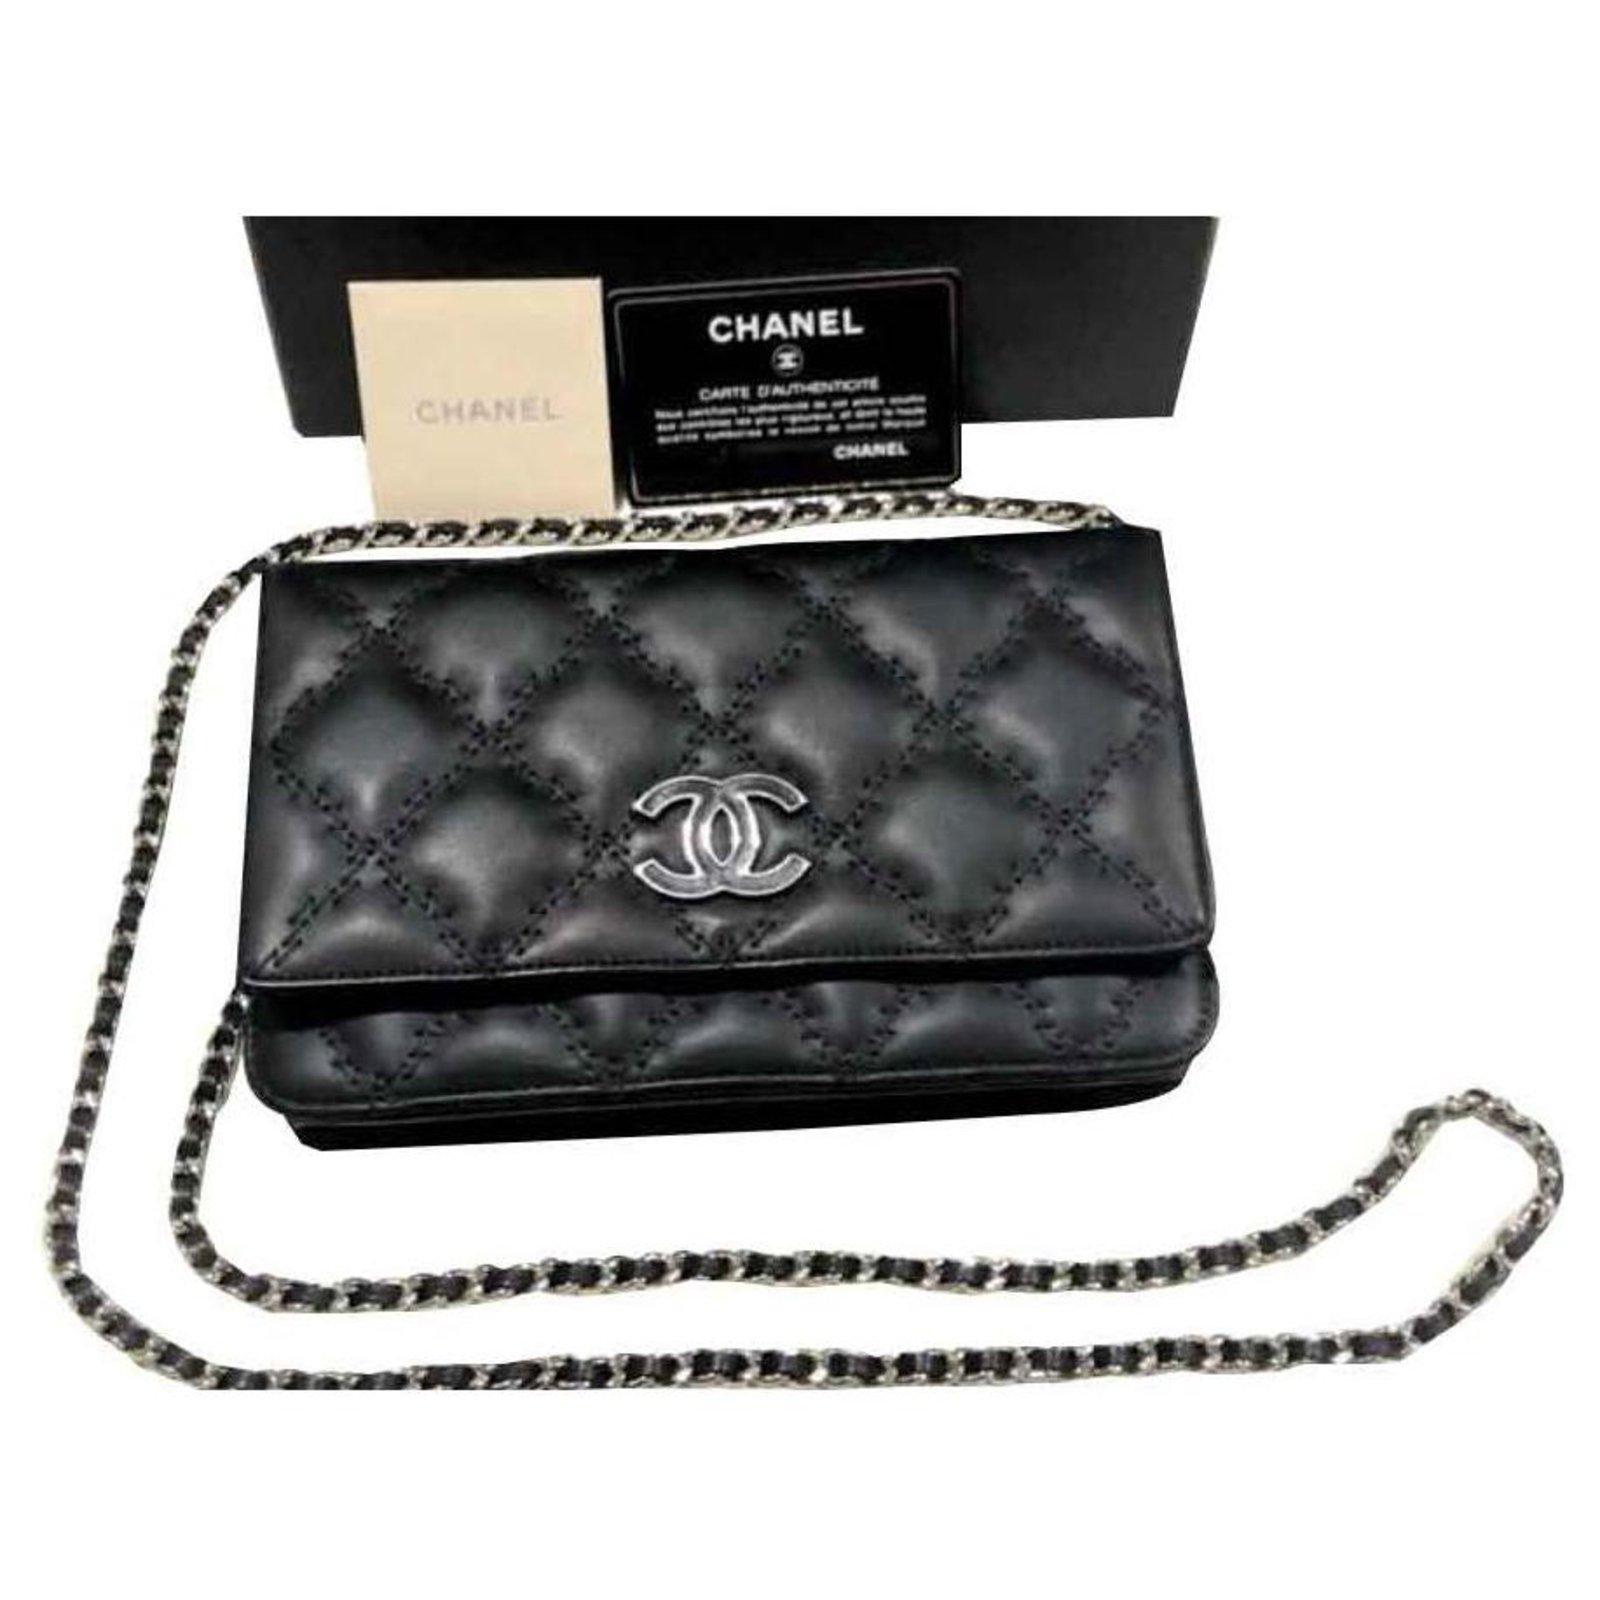 3fe08fc9bf4d10 Chanel Chanel Black Wallet on Chain Handbags Leather Black ref.126852